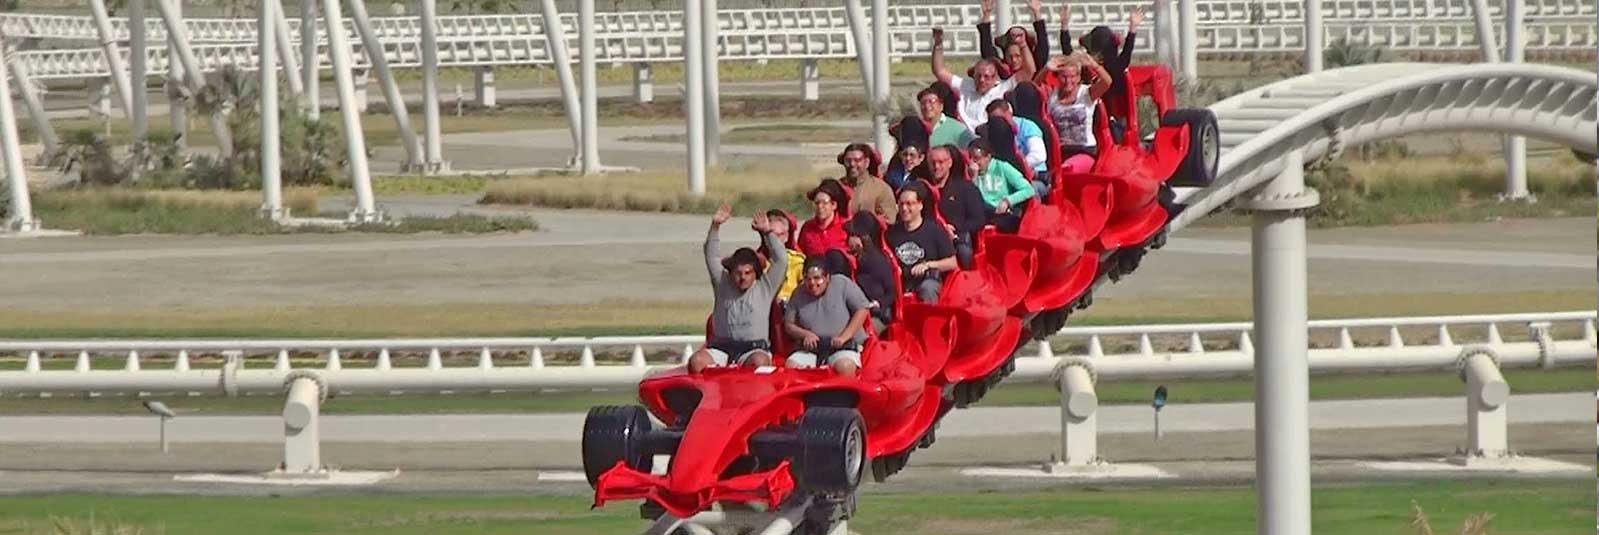 Ferrari-World-Ride.jpg